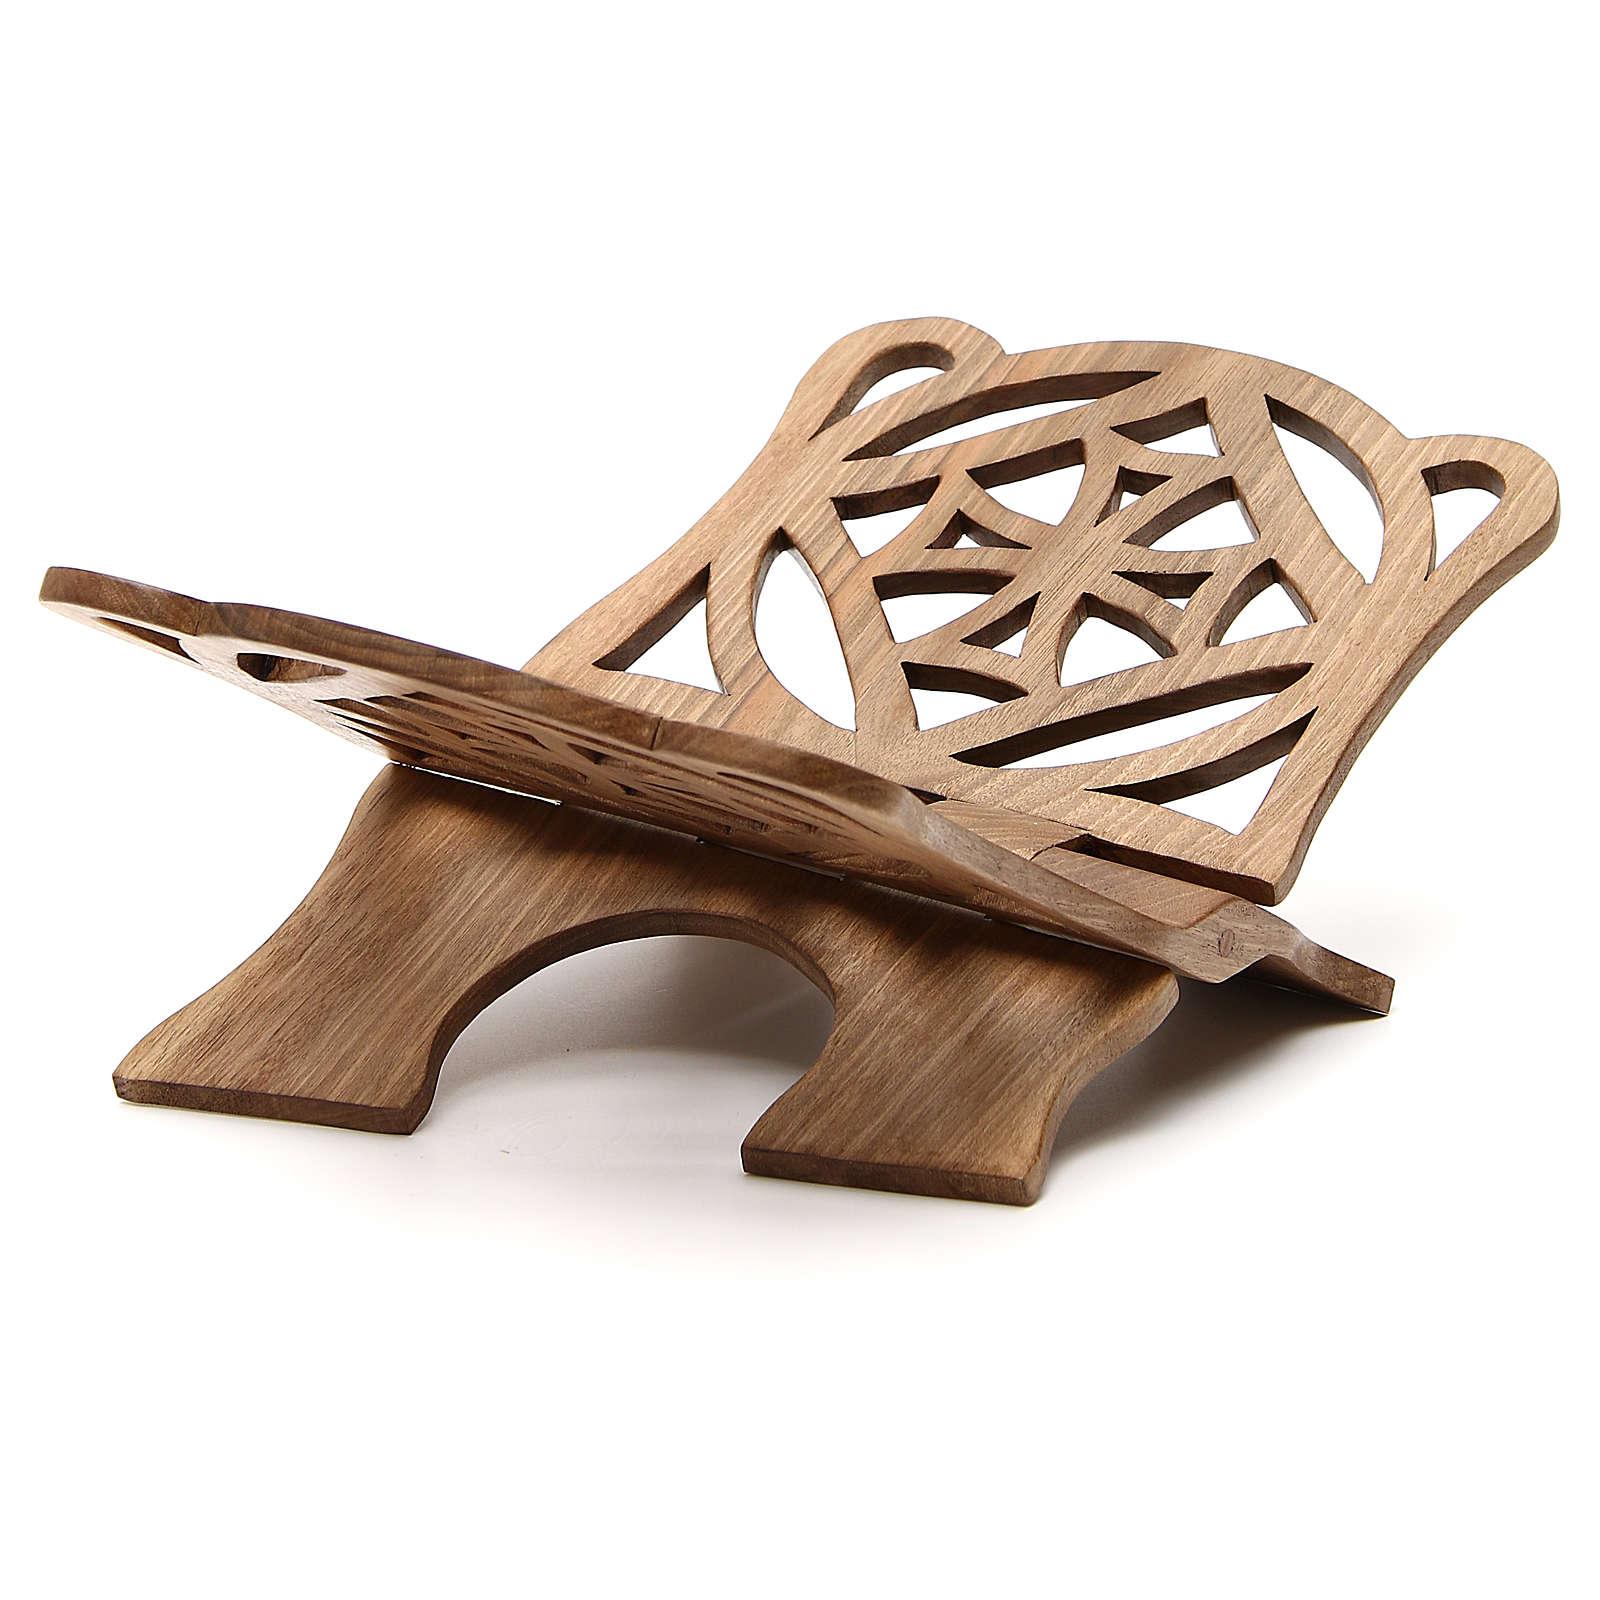 Book stand in Italian walnut wood, simple model, Bethlehem monks 4